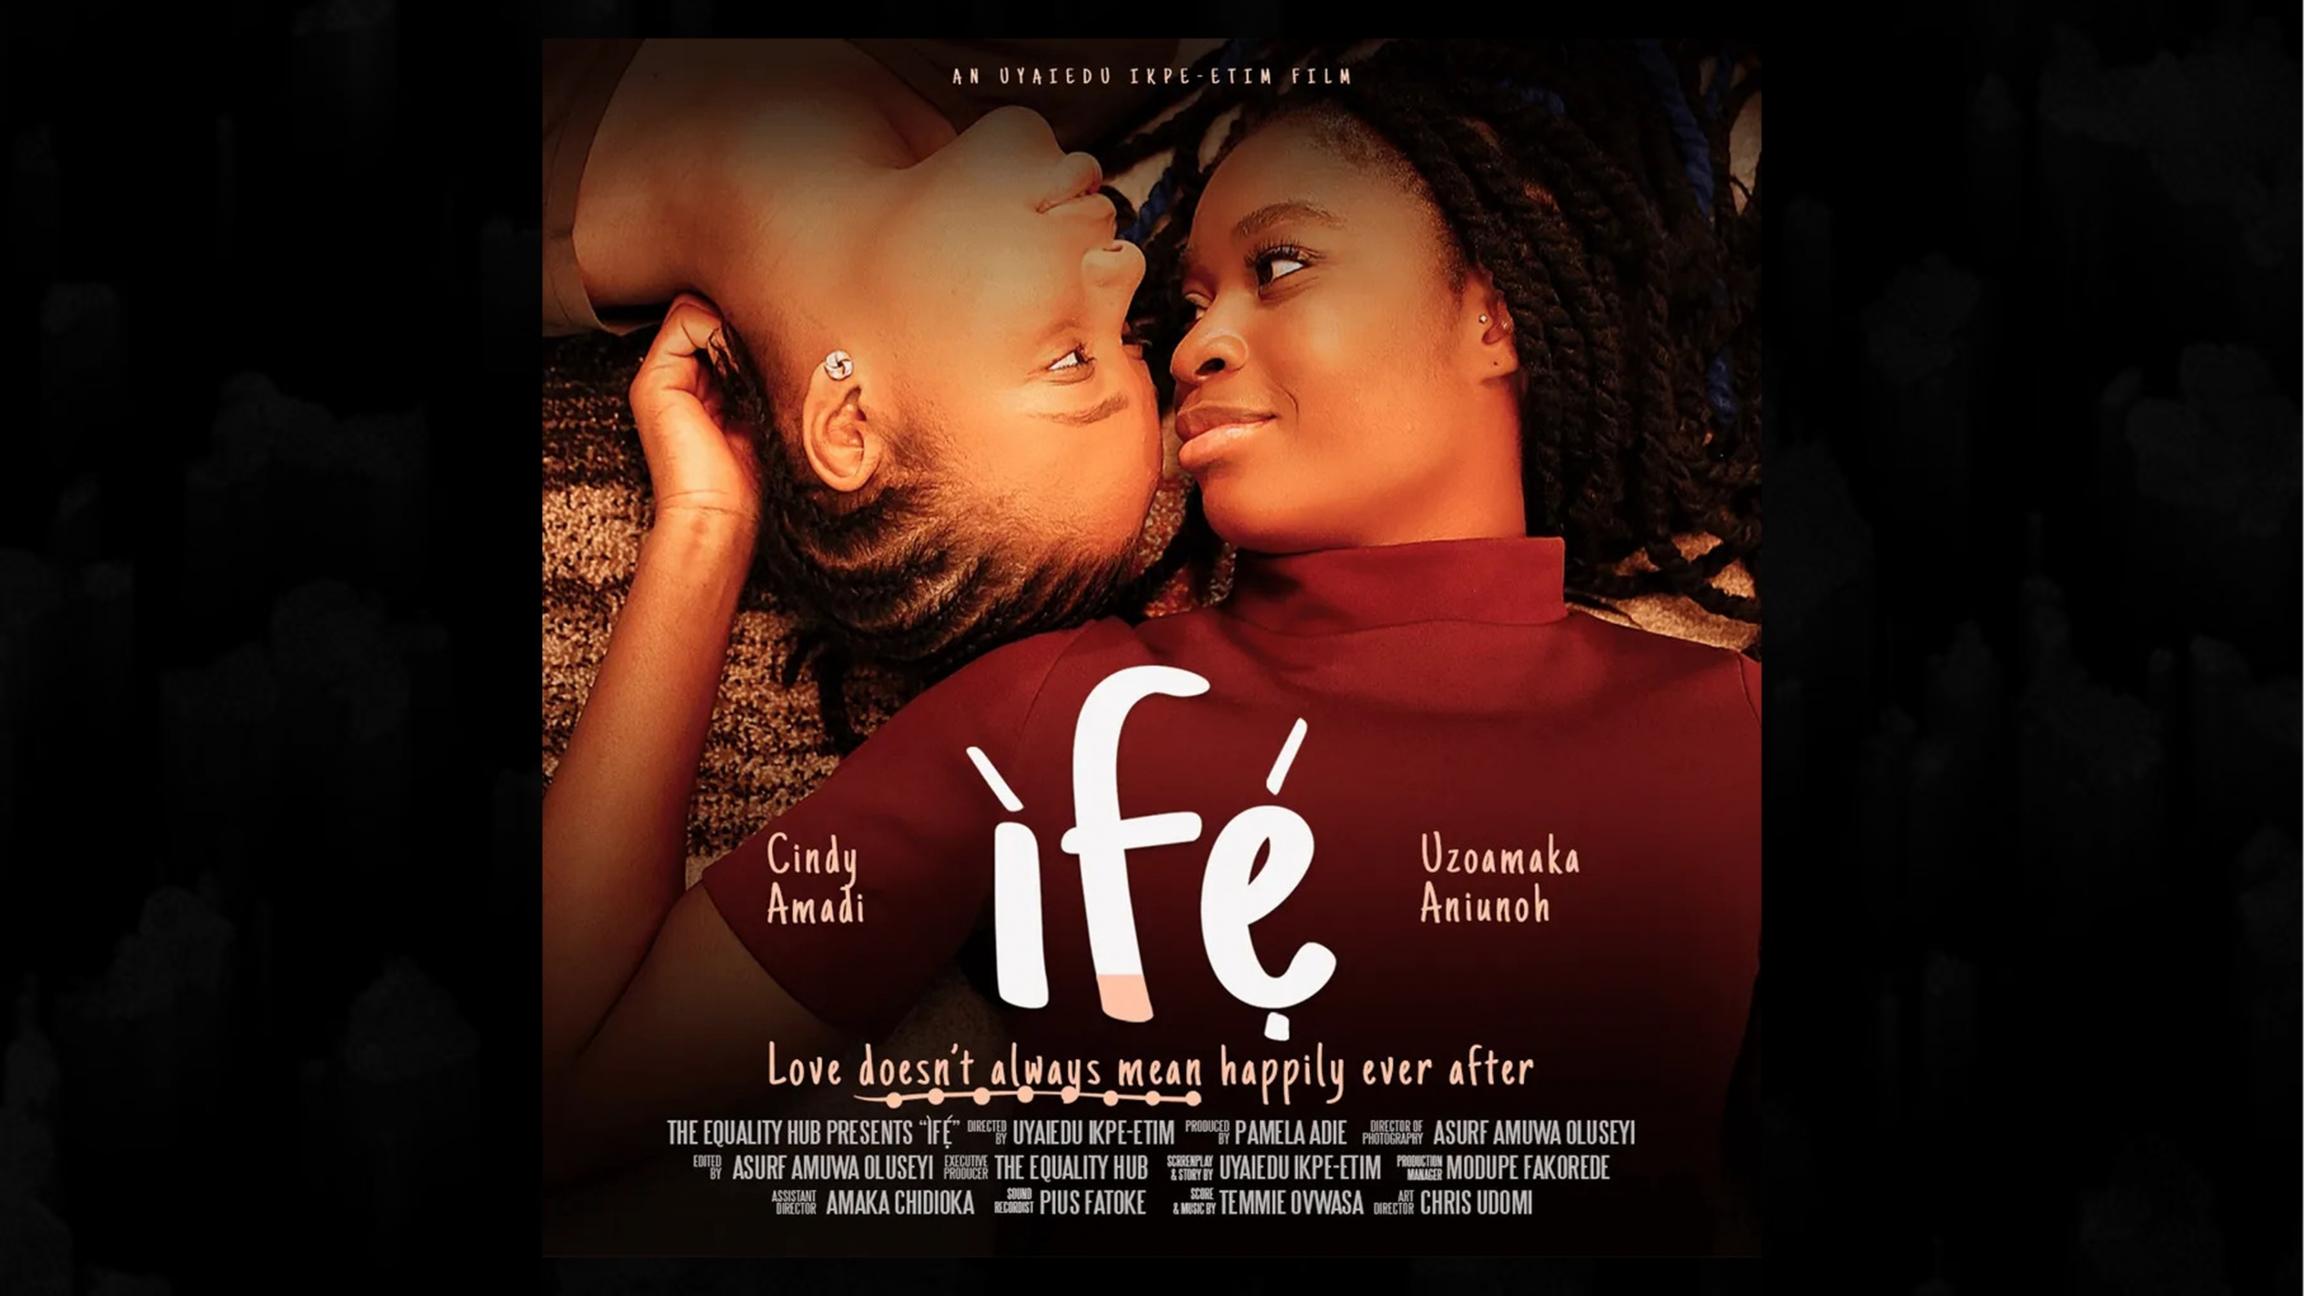 """Ífé"" film features two women in love in Nigeria."